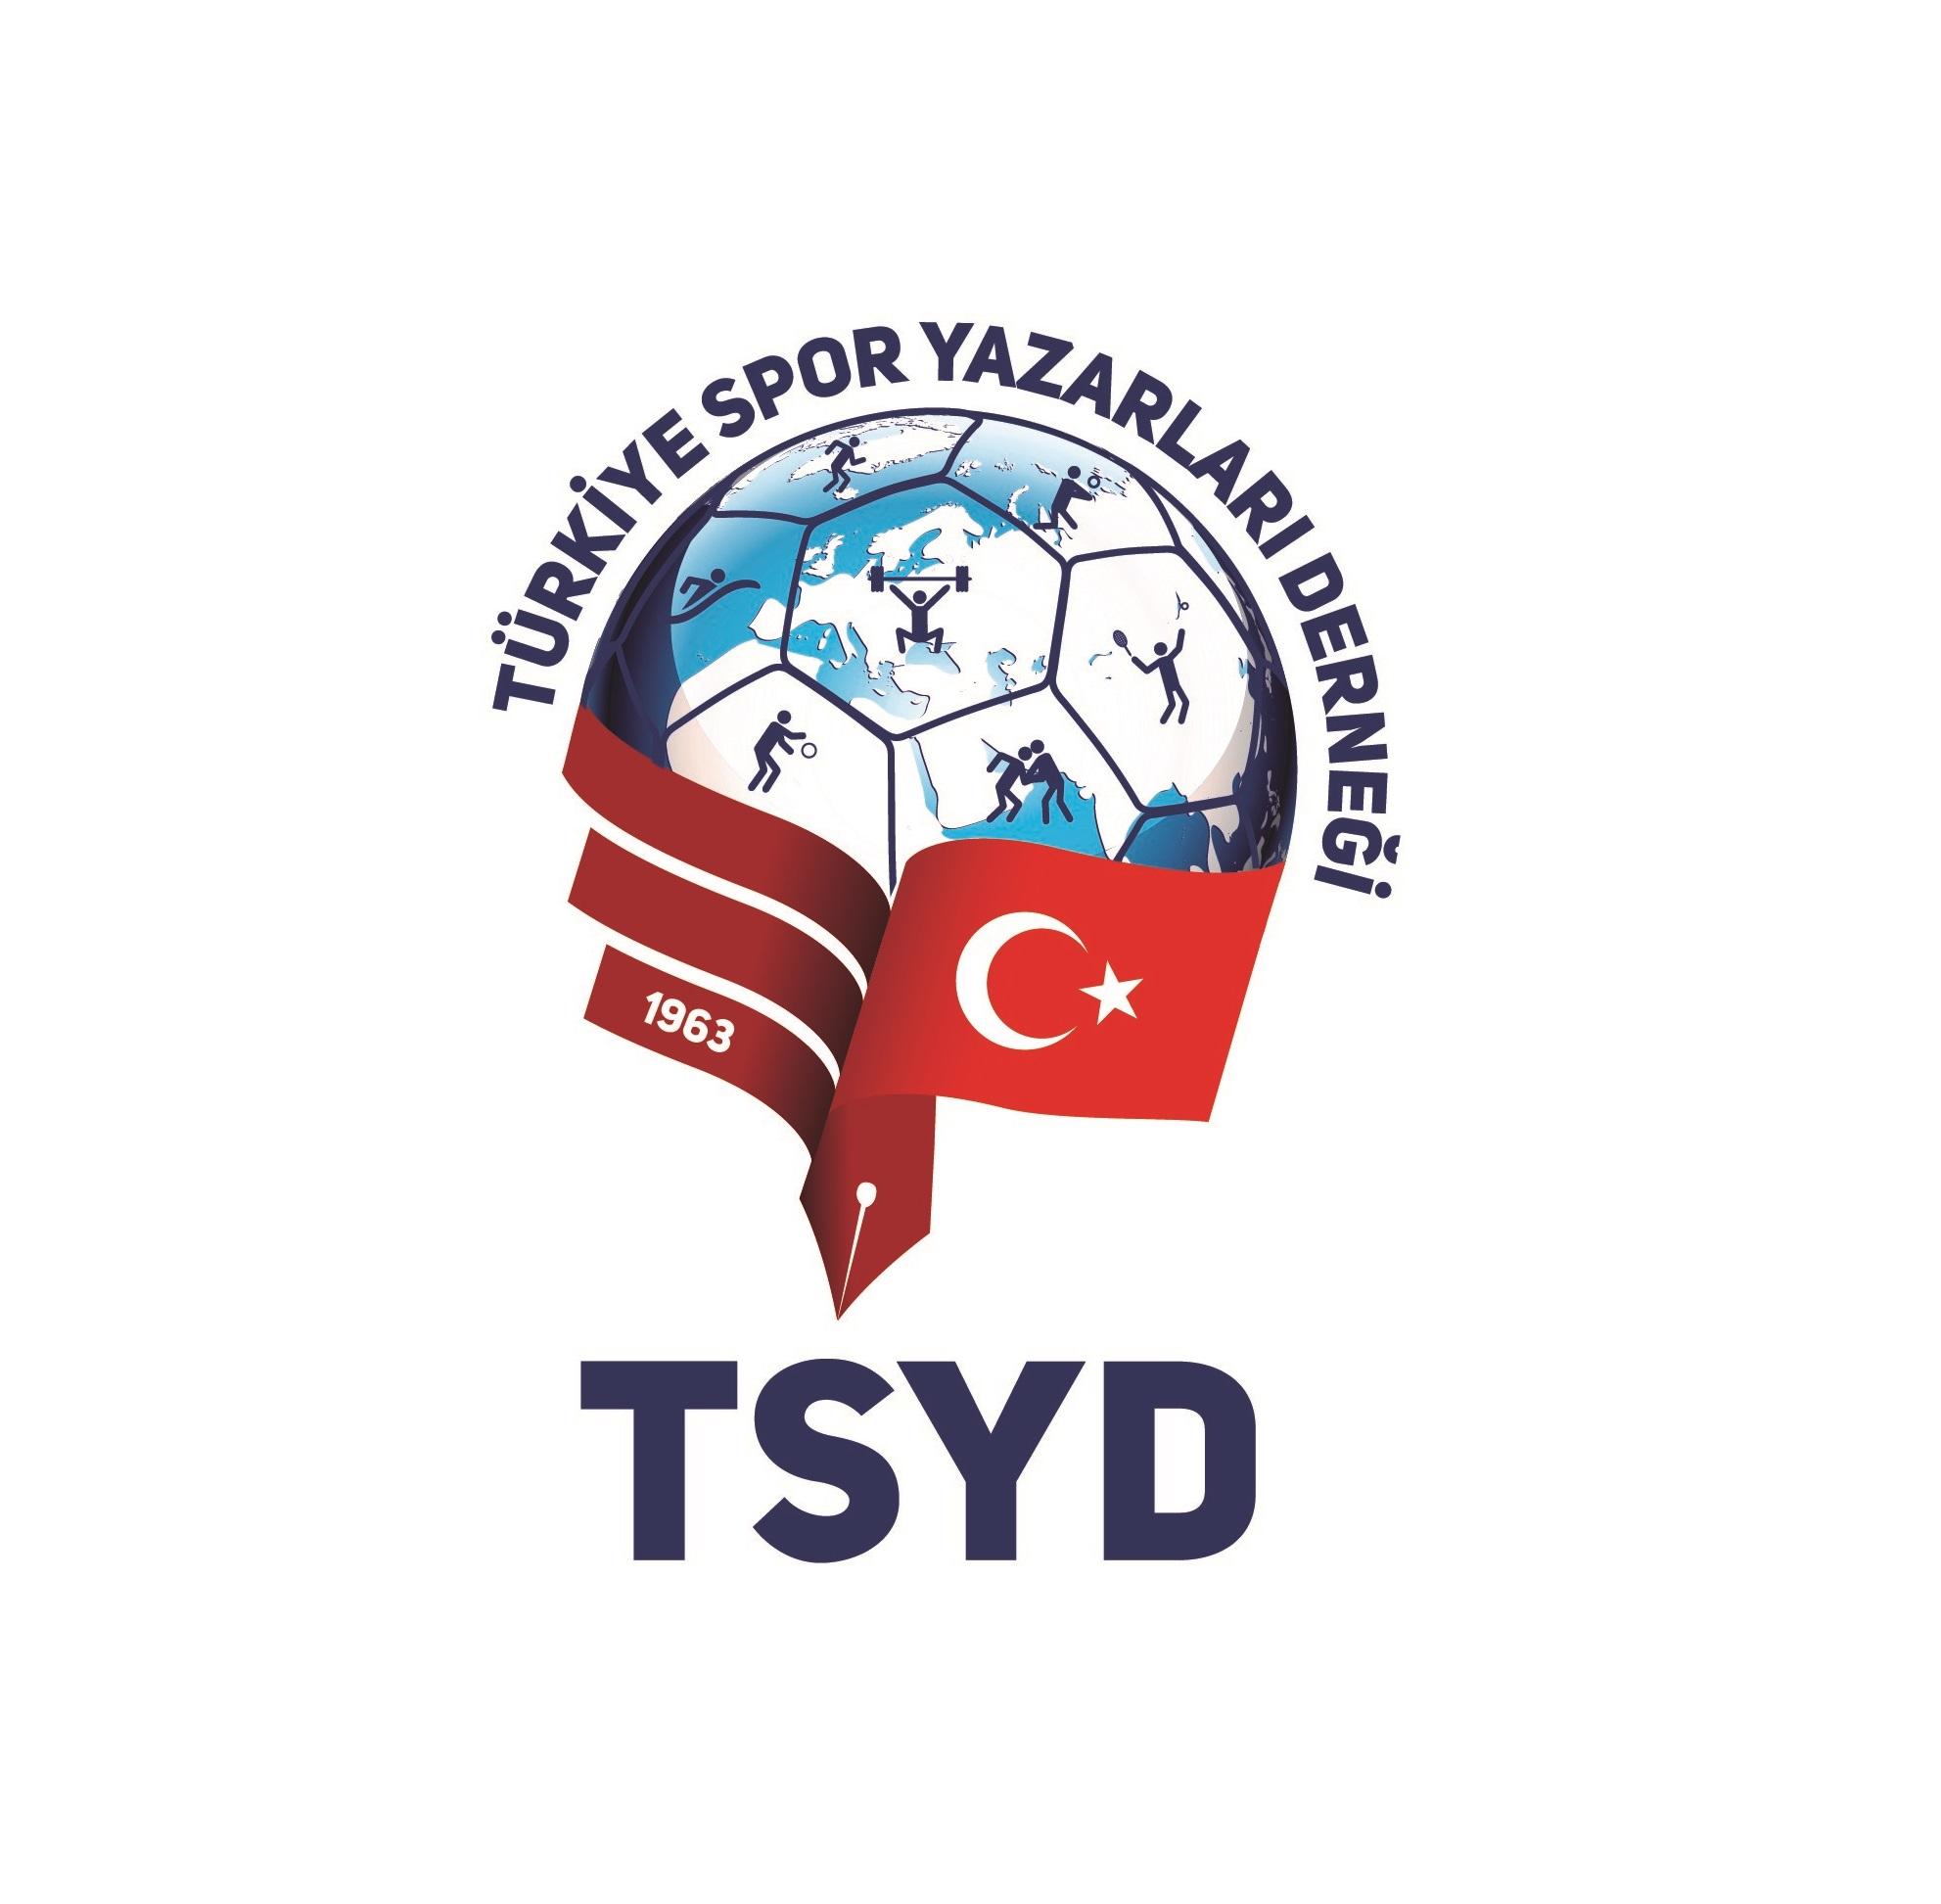 TSYD'den Tolgay'lara başsağlığı mesajı